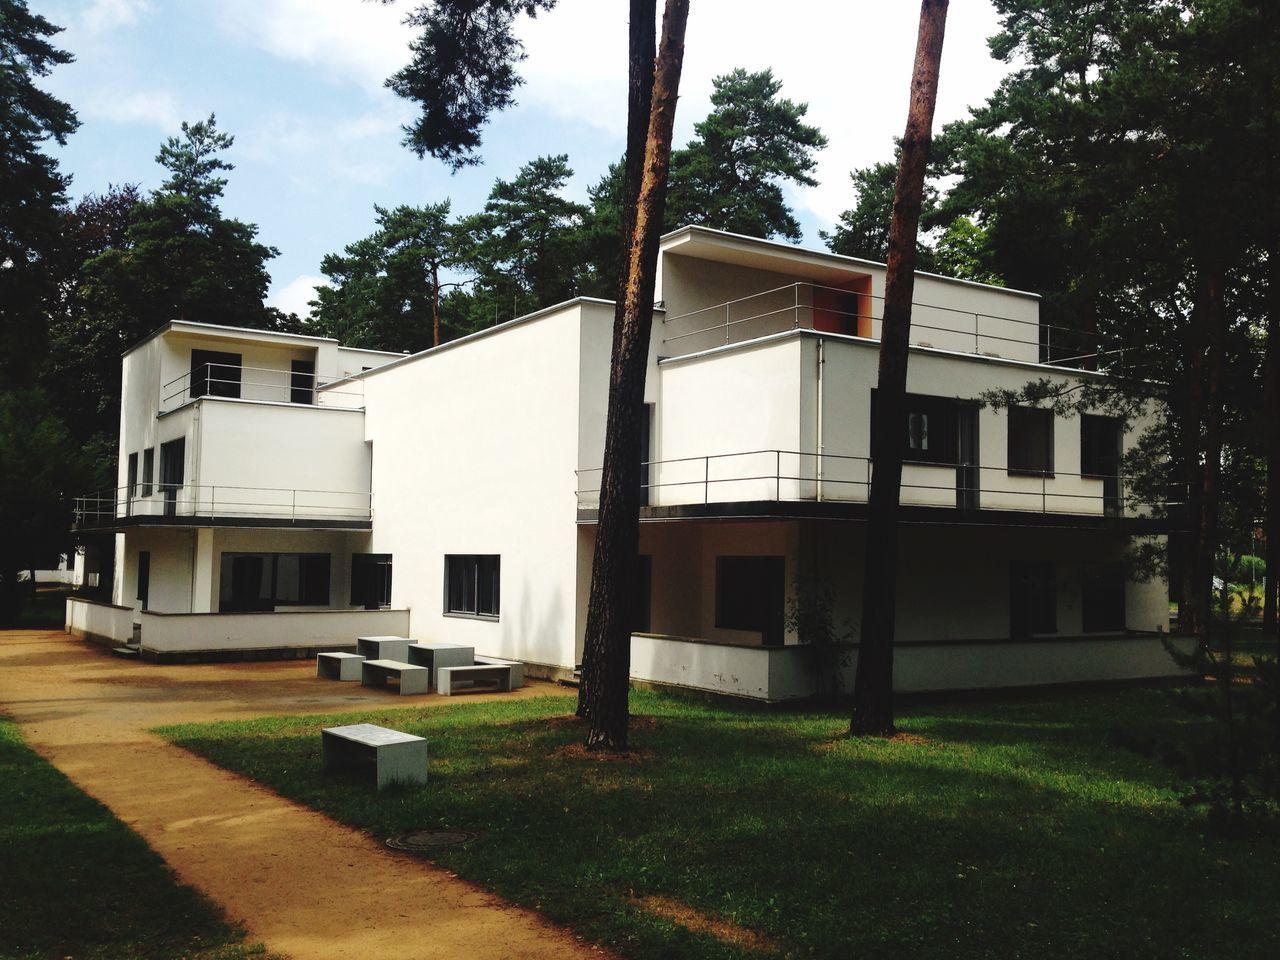 Kadinsky Klee Houses